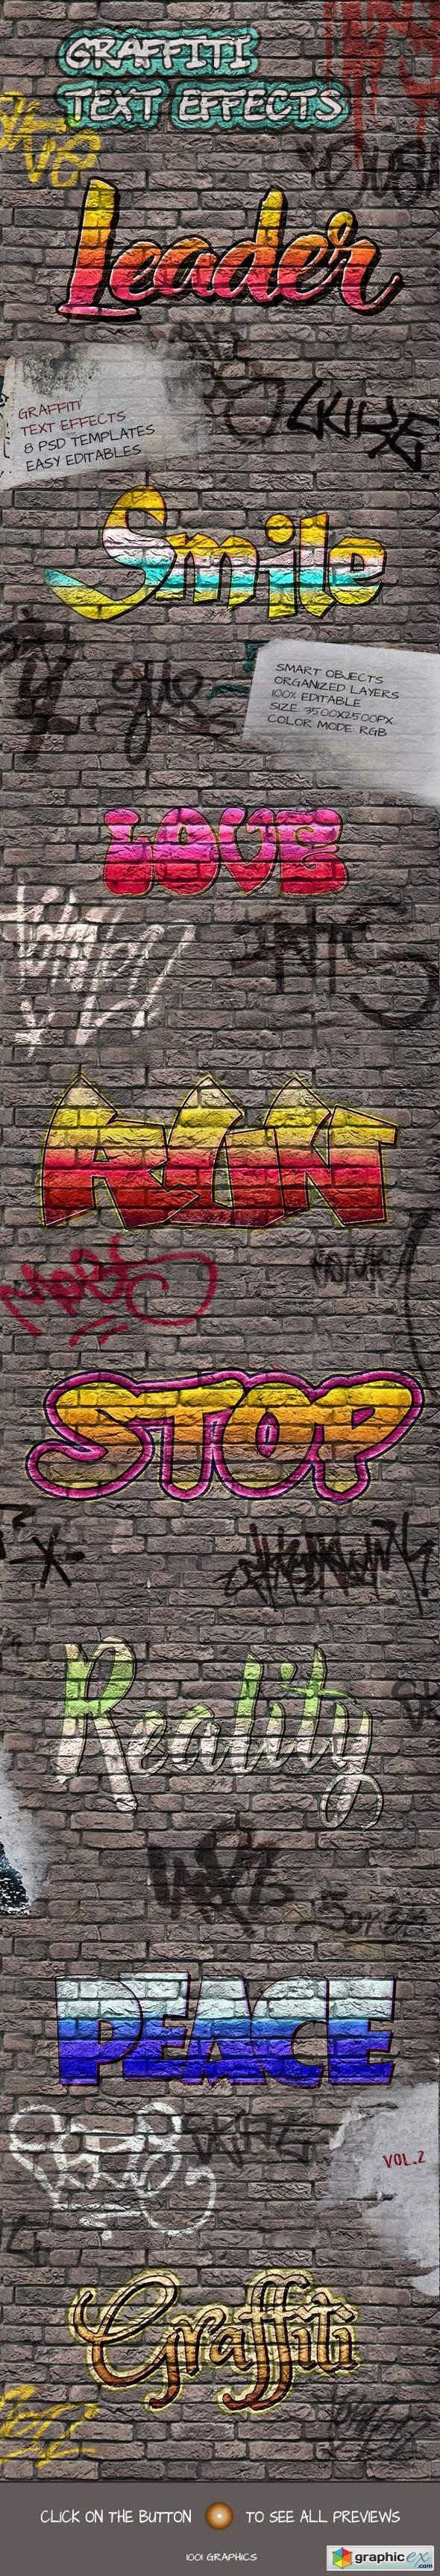 8 Graffiti Text Effects - 8 PSD Templates Vol.2